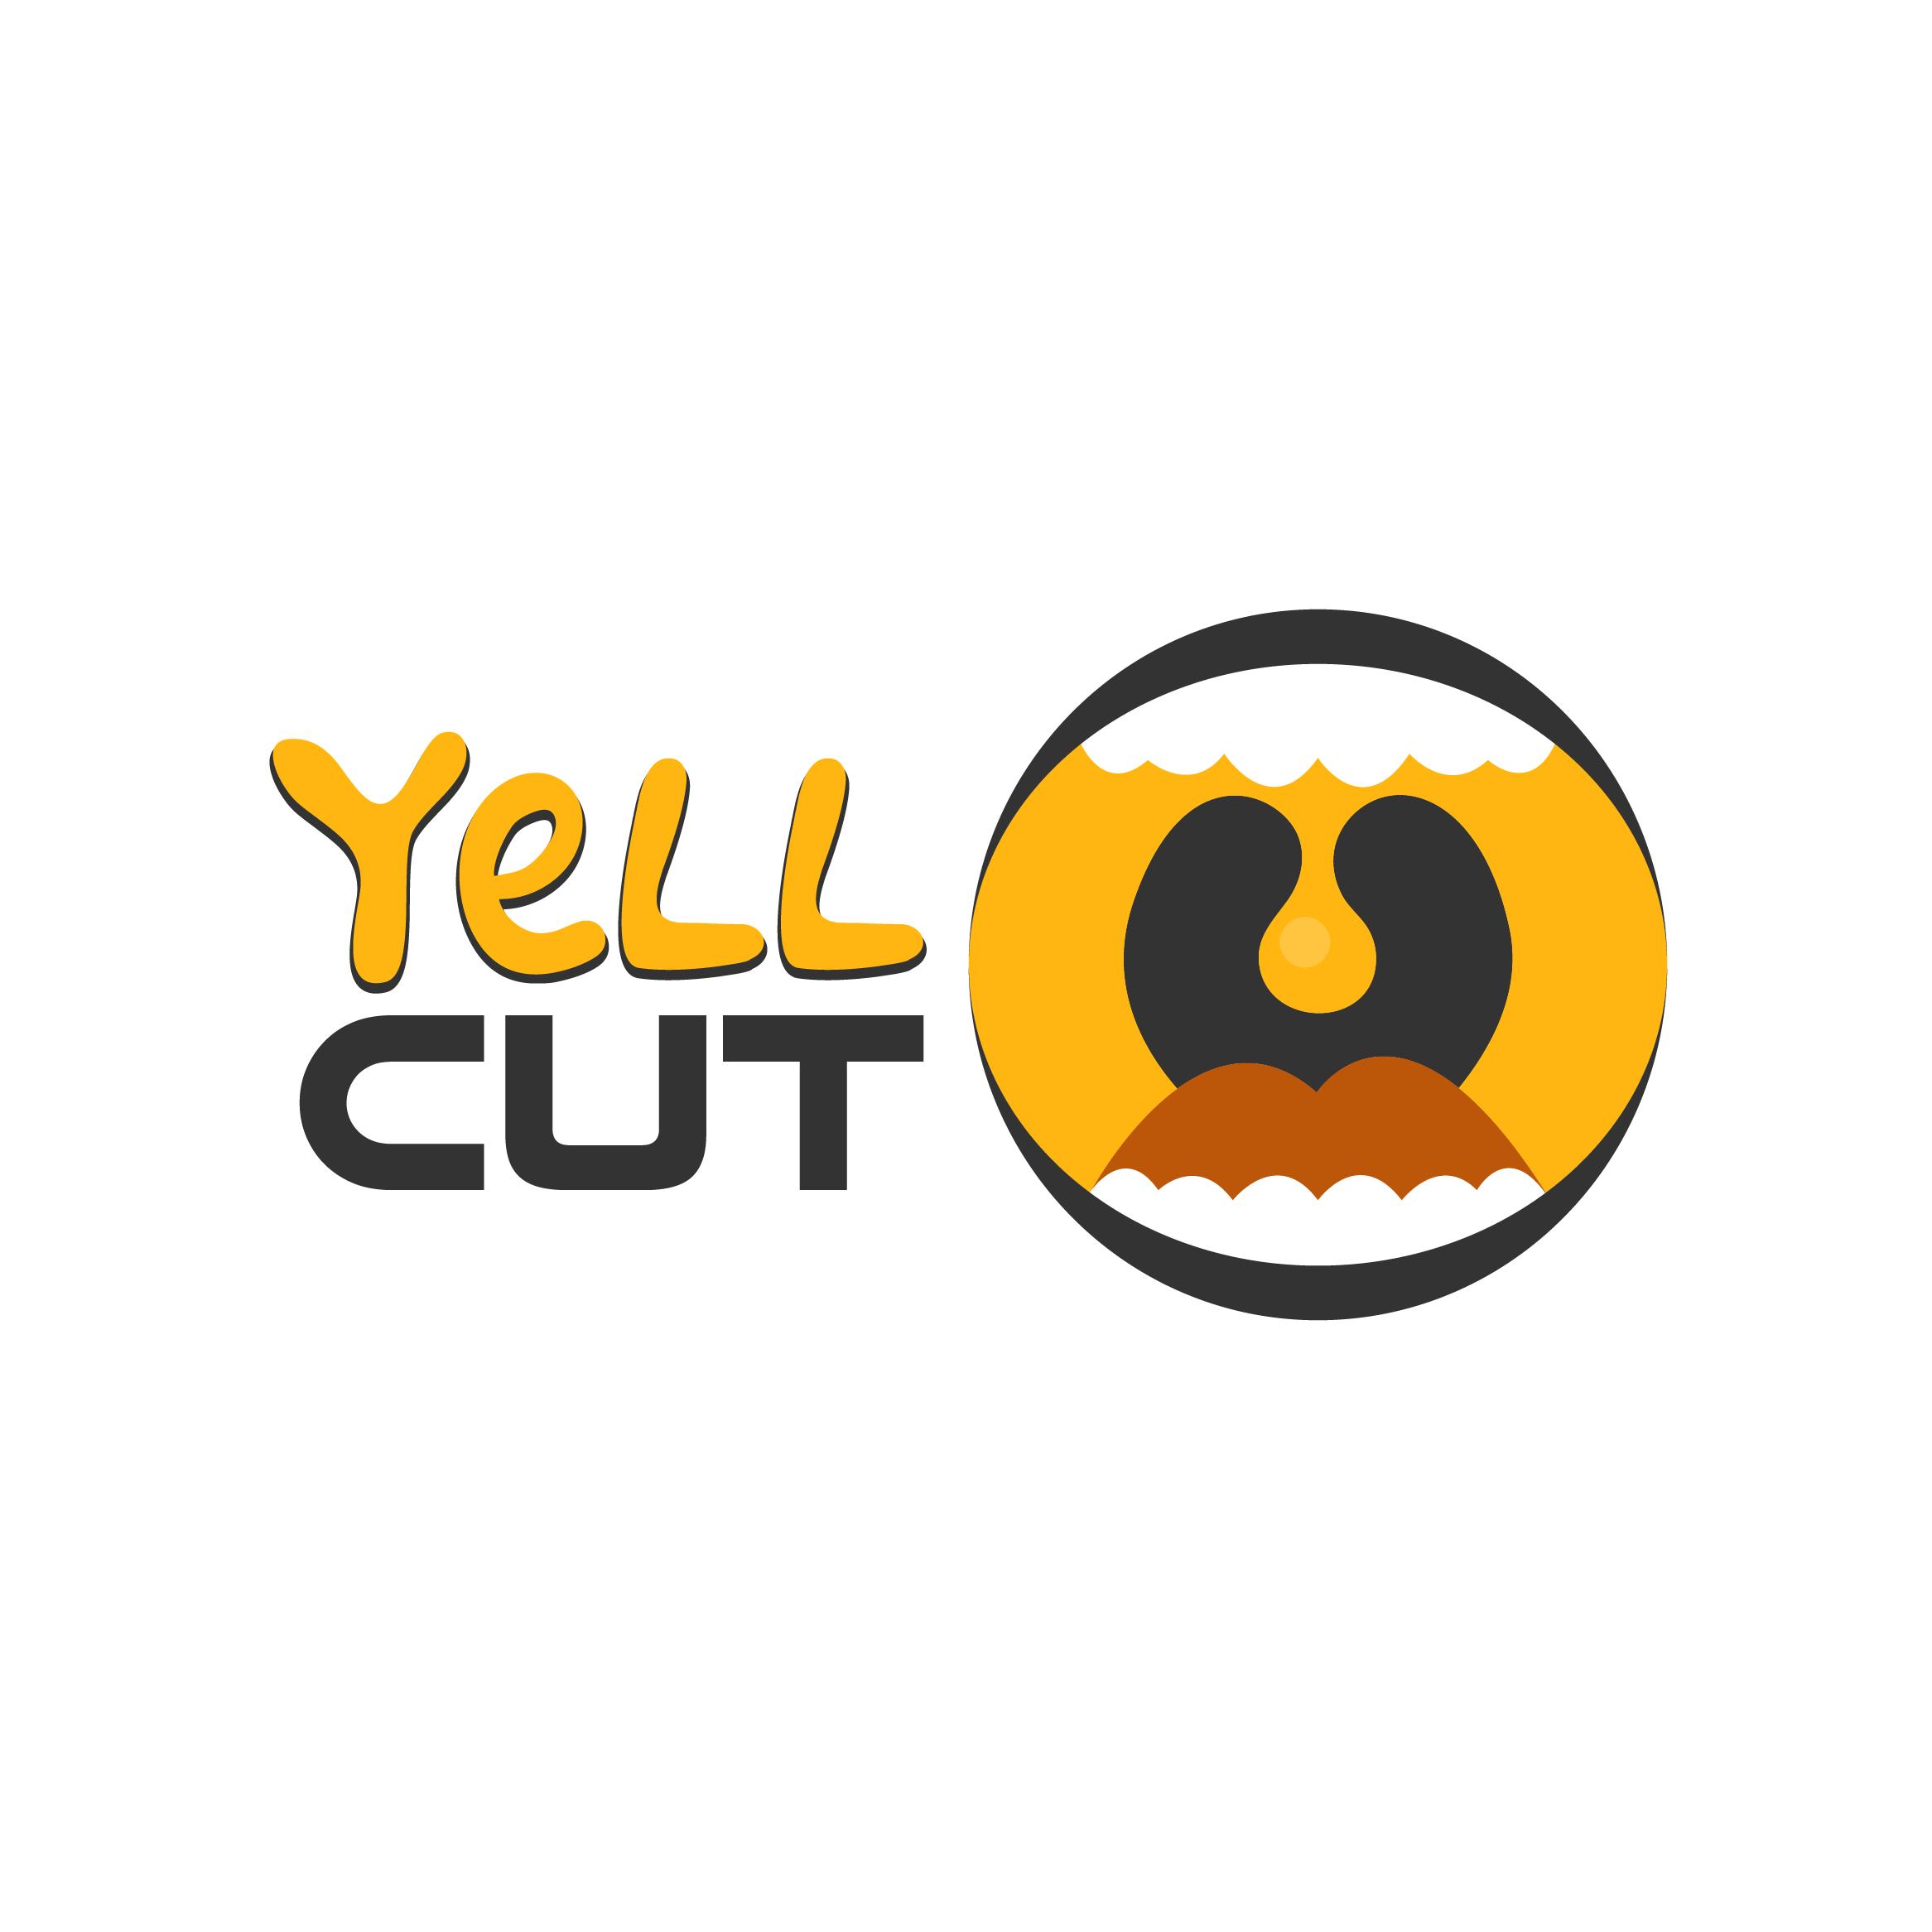 Yell Cut